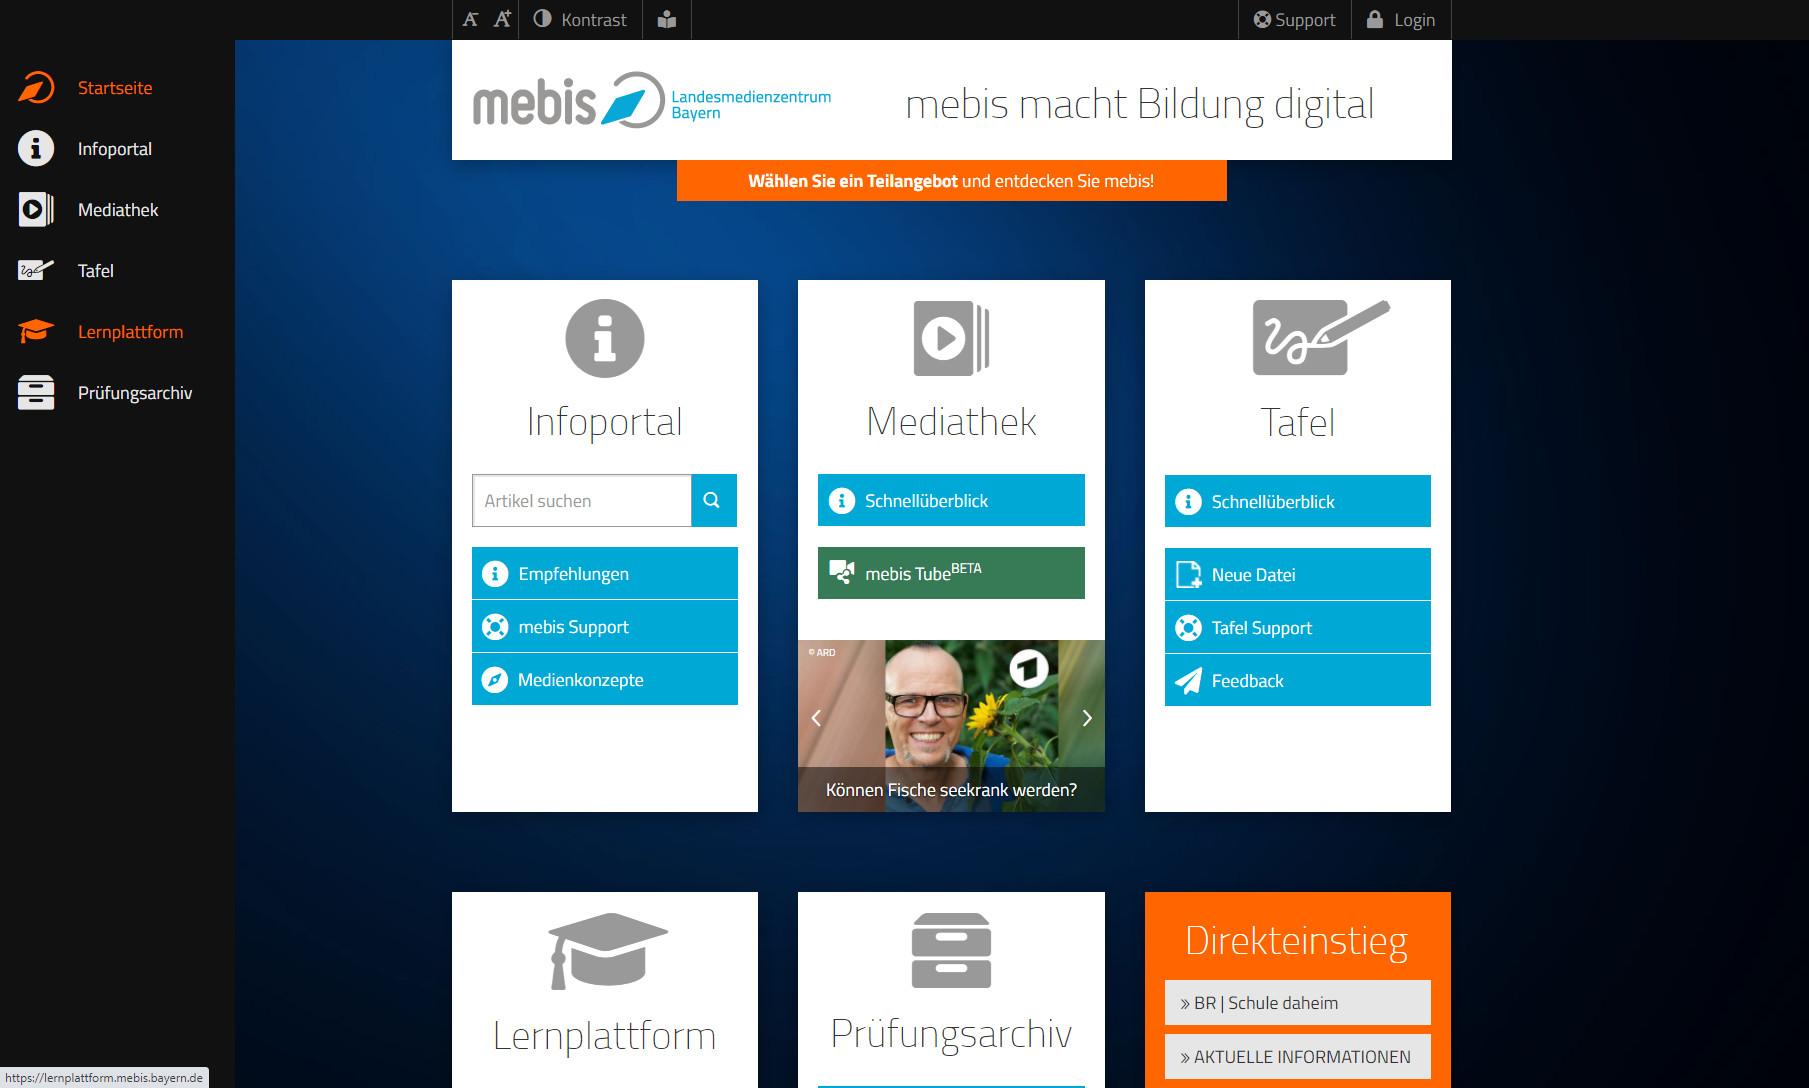 Screenshot 1 - Mebis: Digitaler Unterricht